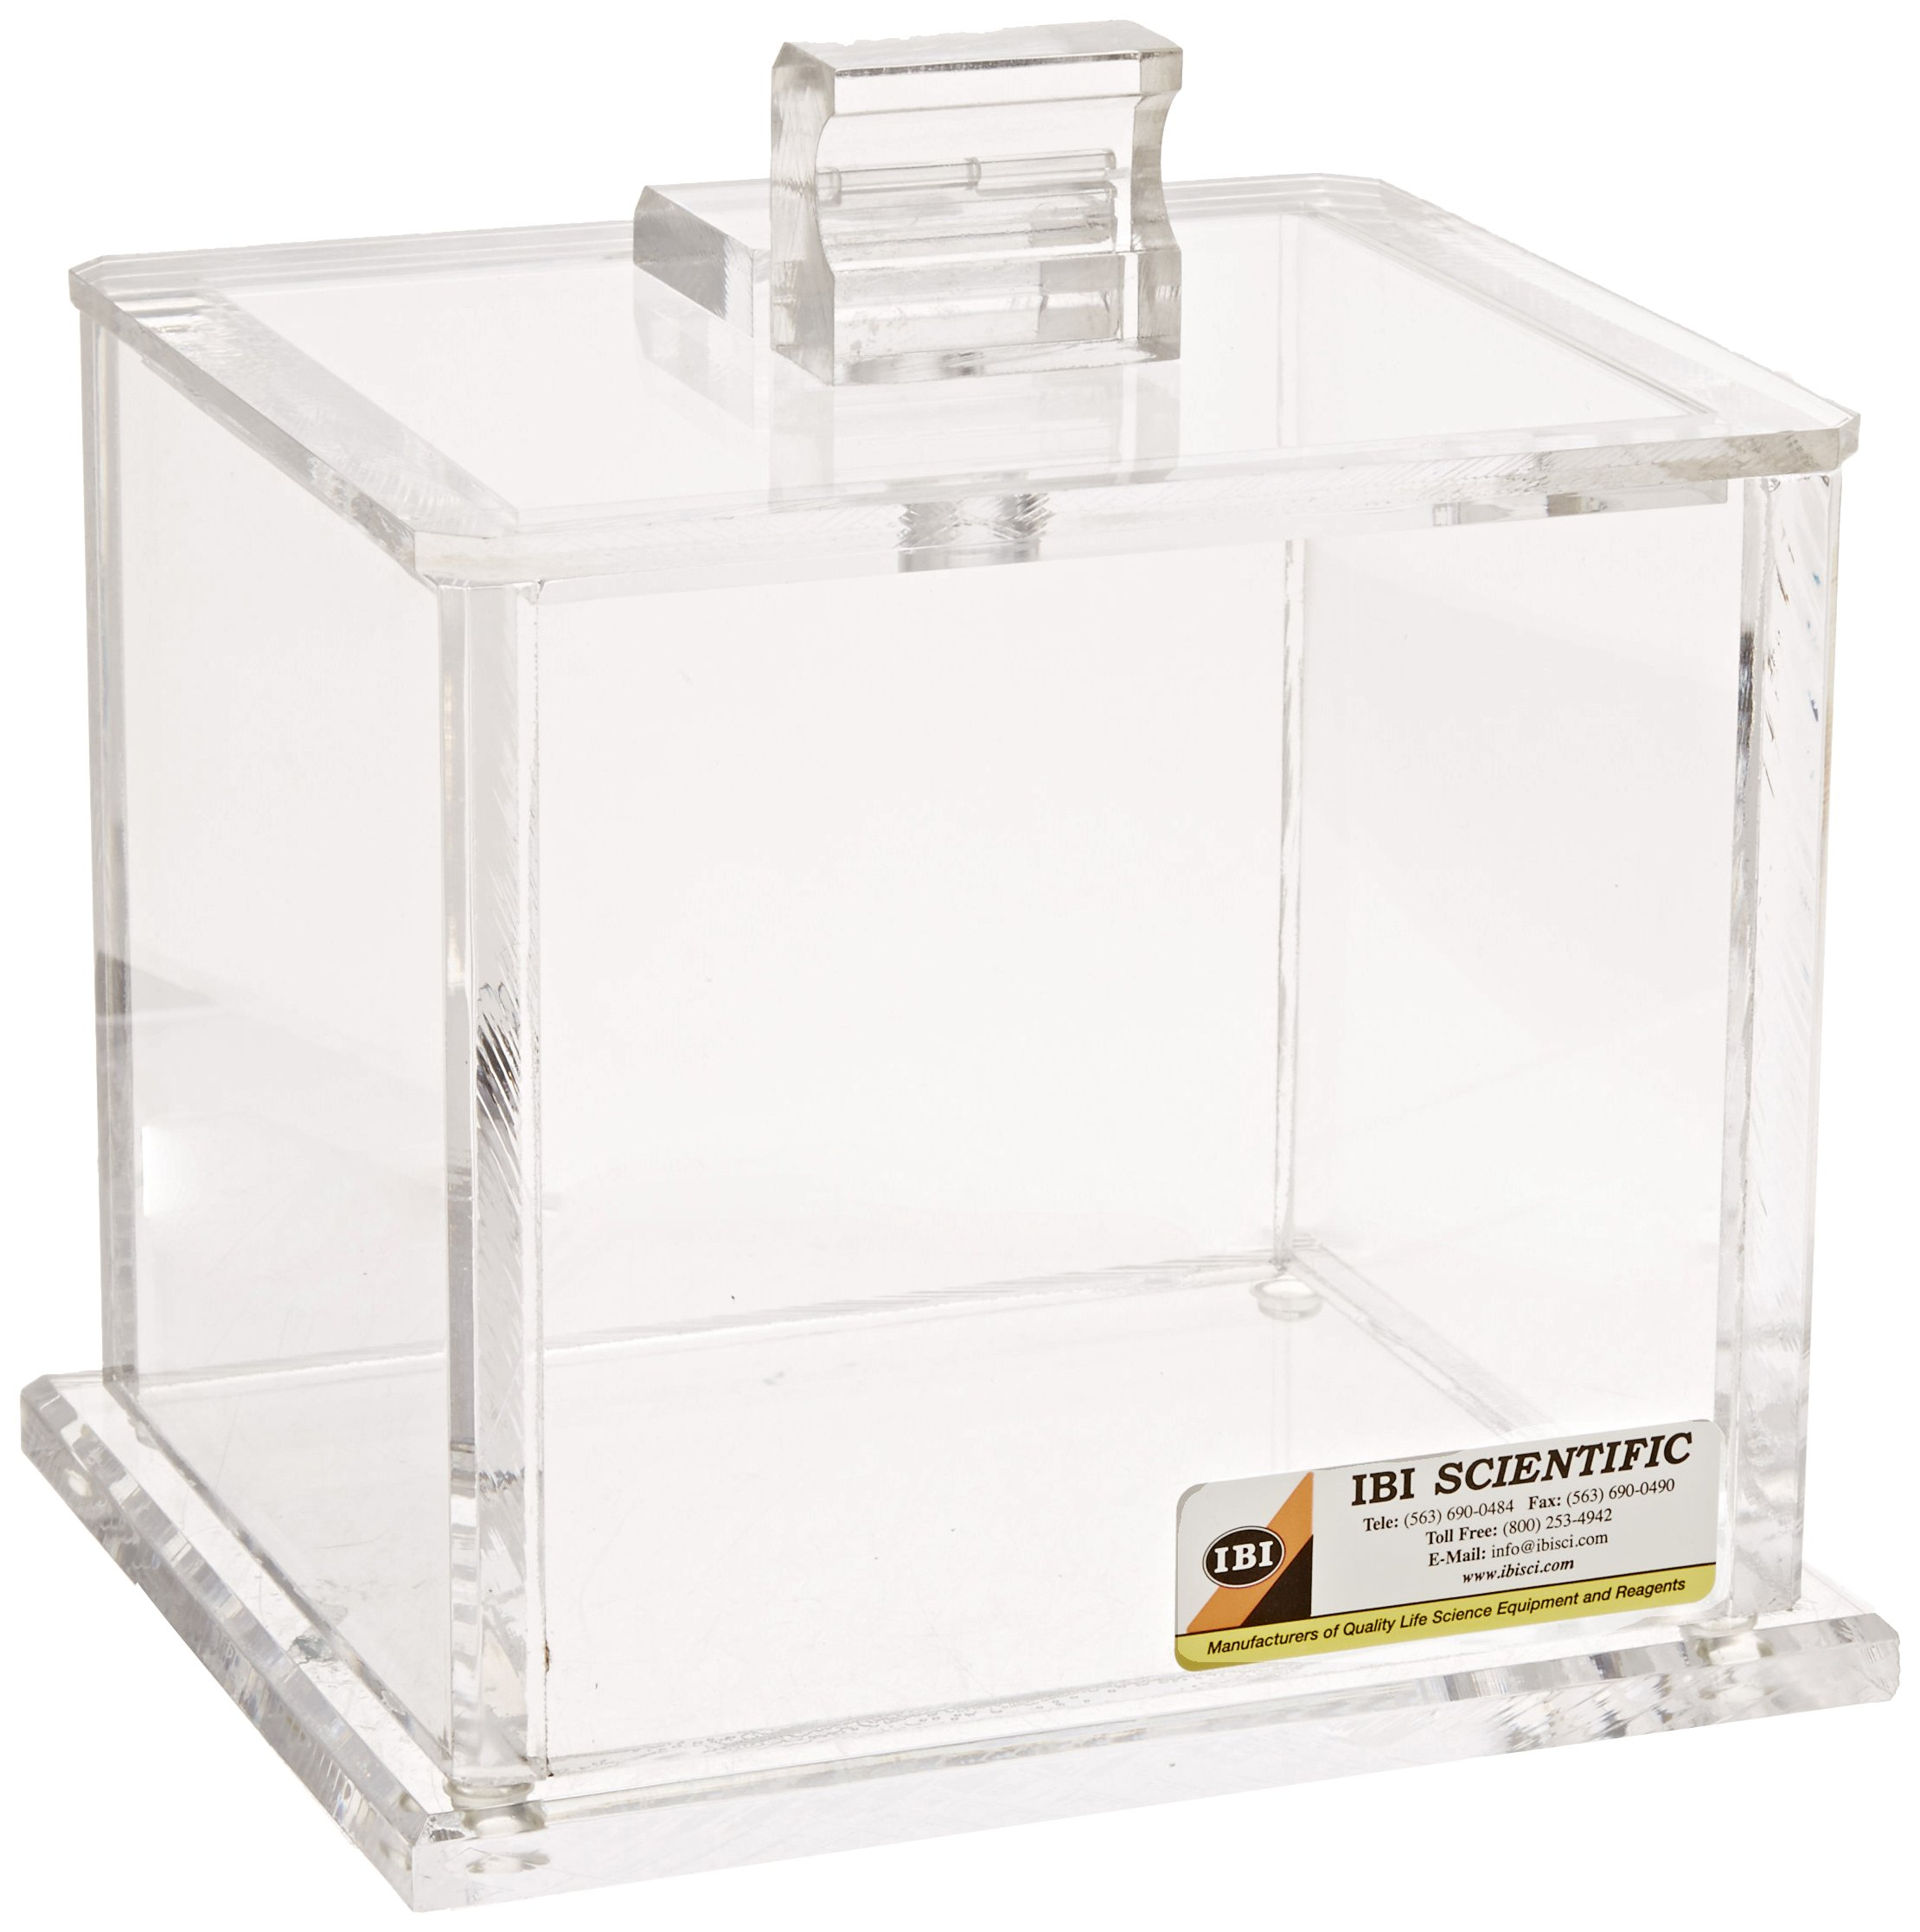 IBI Scientific FL-60 Cast Acrylic Flip-Top Waste Container, Small